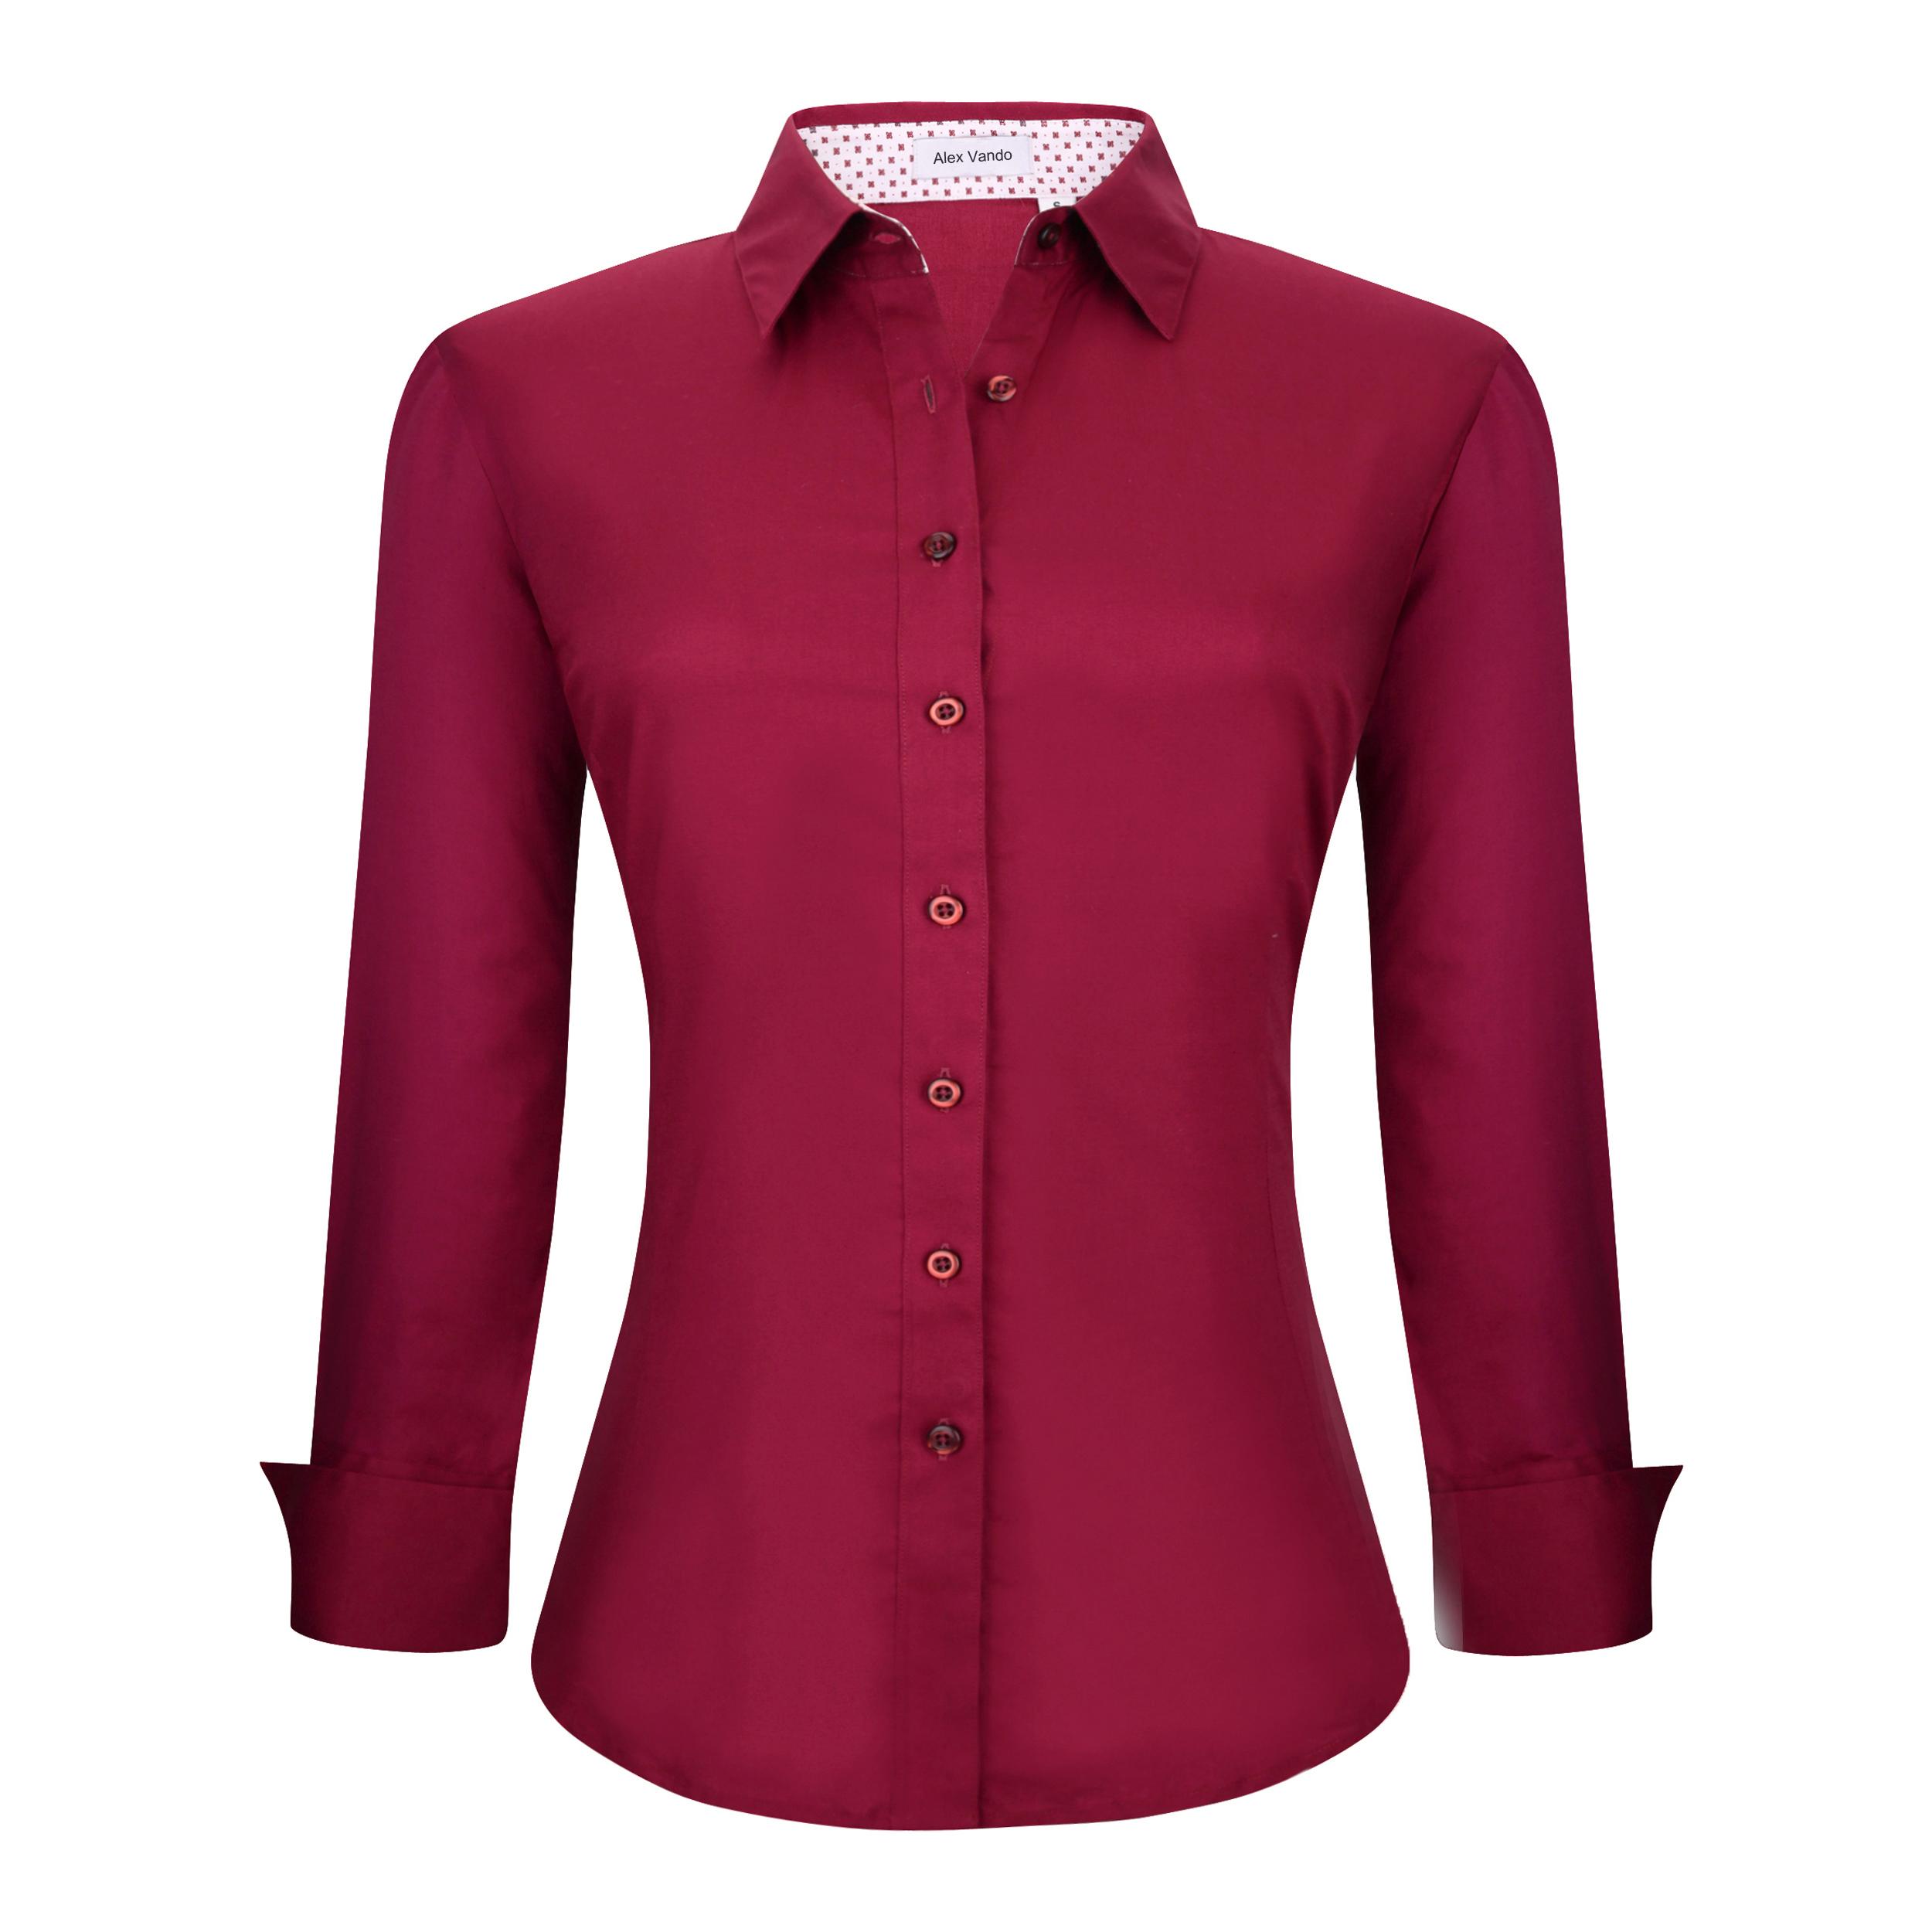 36ae194126 Womens Button Down Shirts Long Sleeve Cotton Stretch Work Shirt Burgundy  Item NO  Women-01-Burgundy